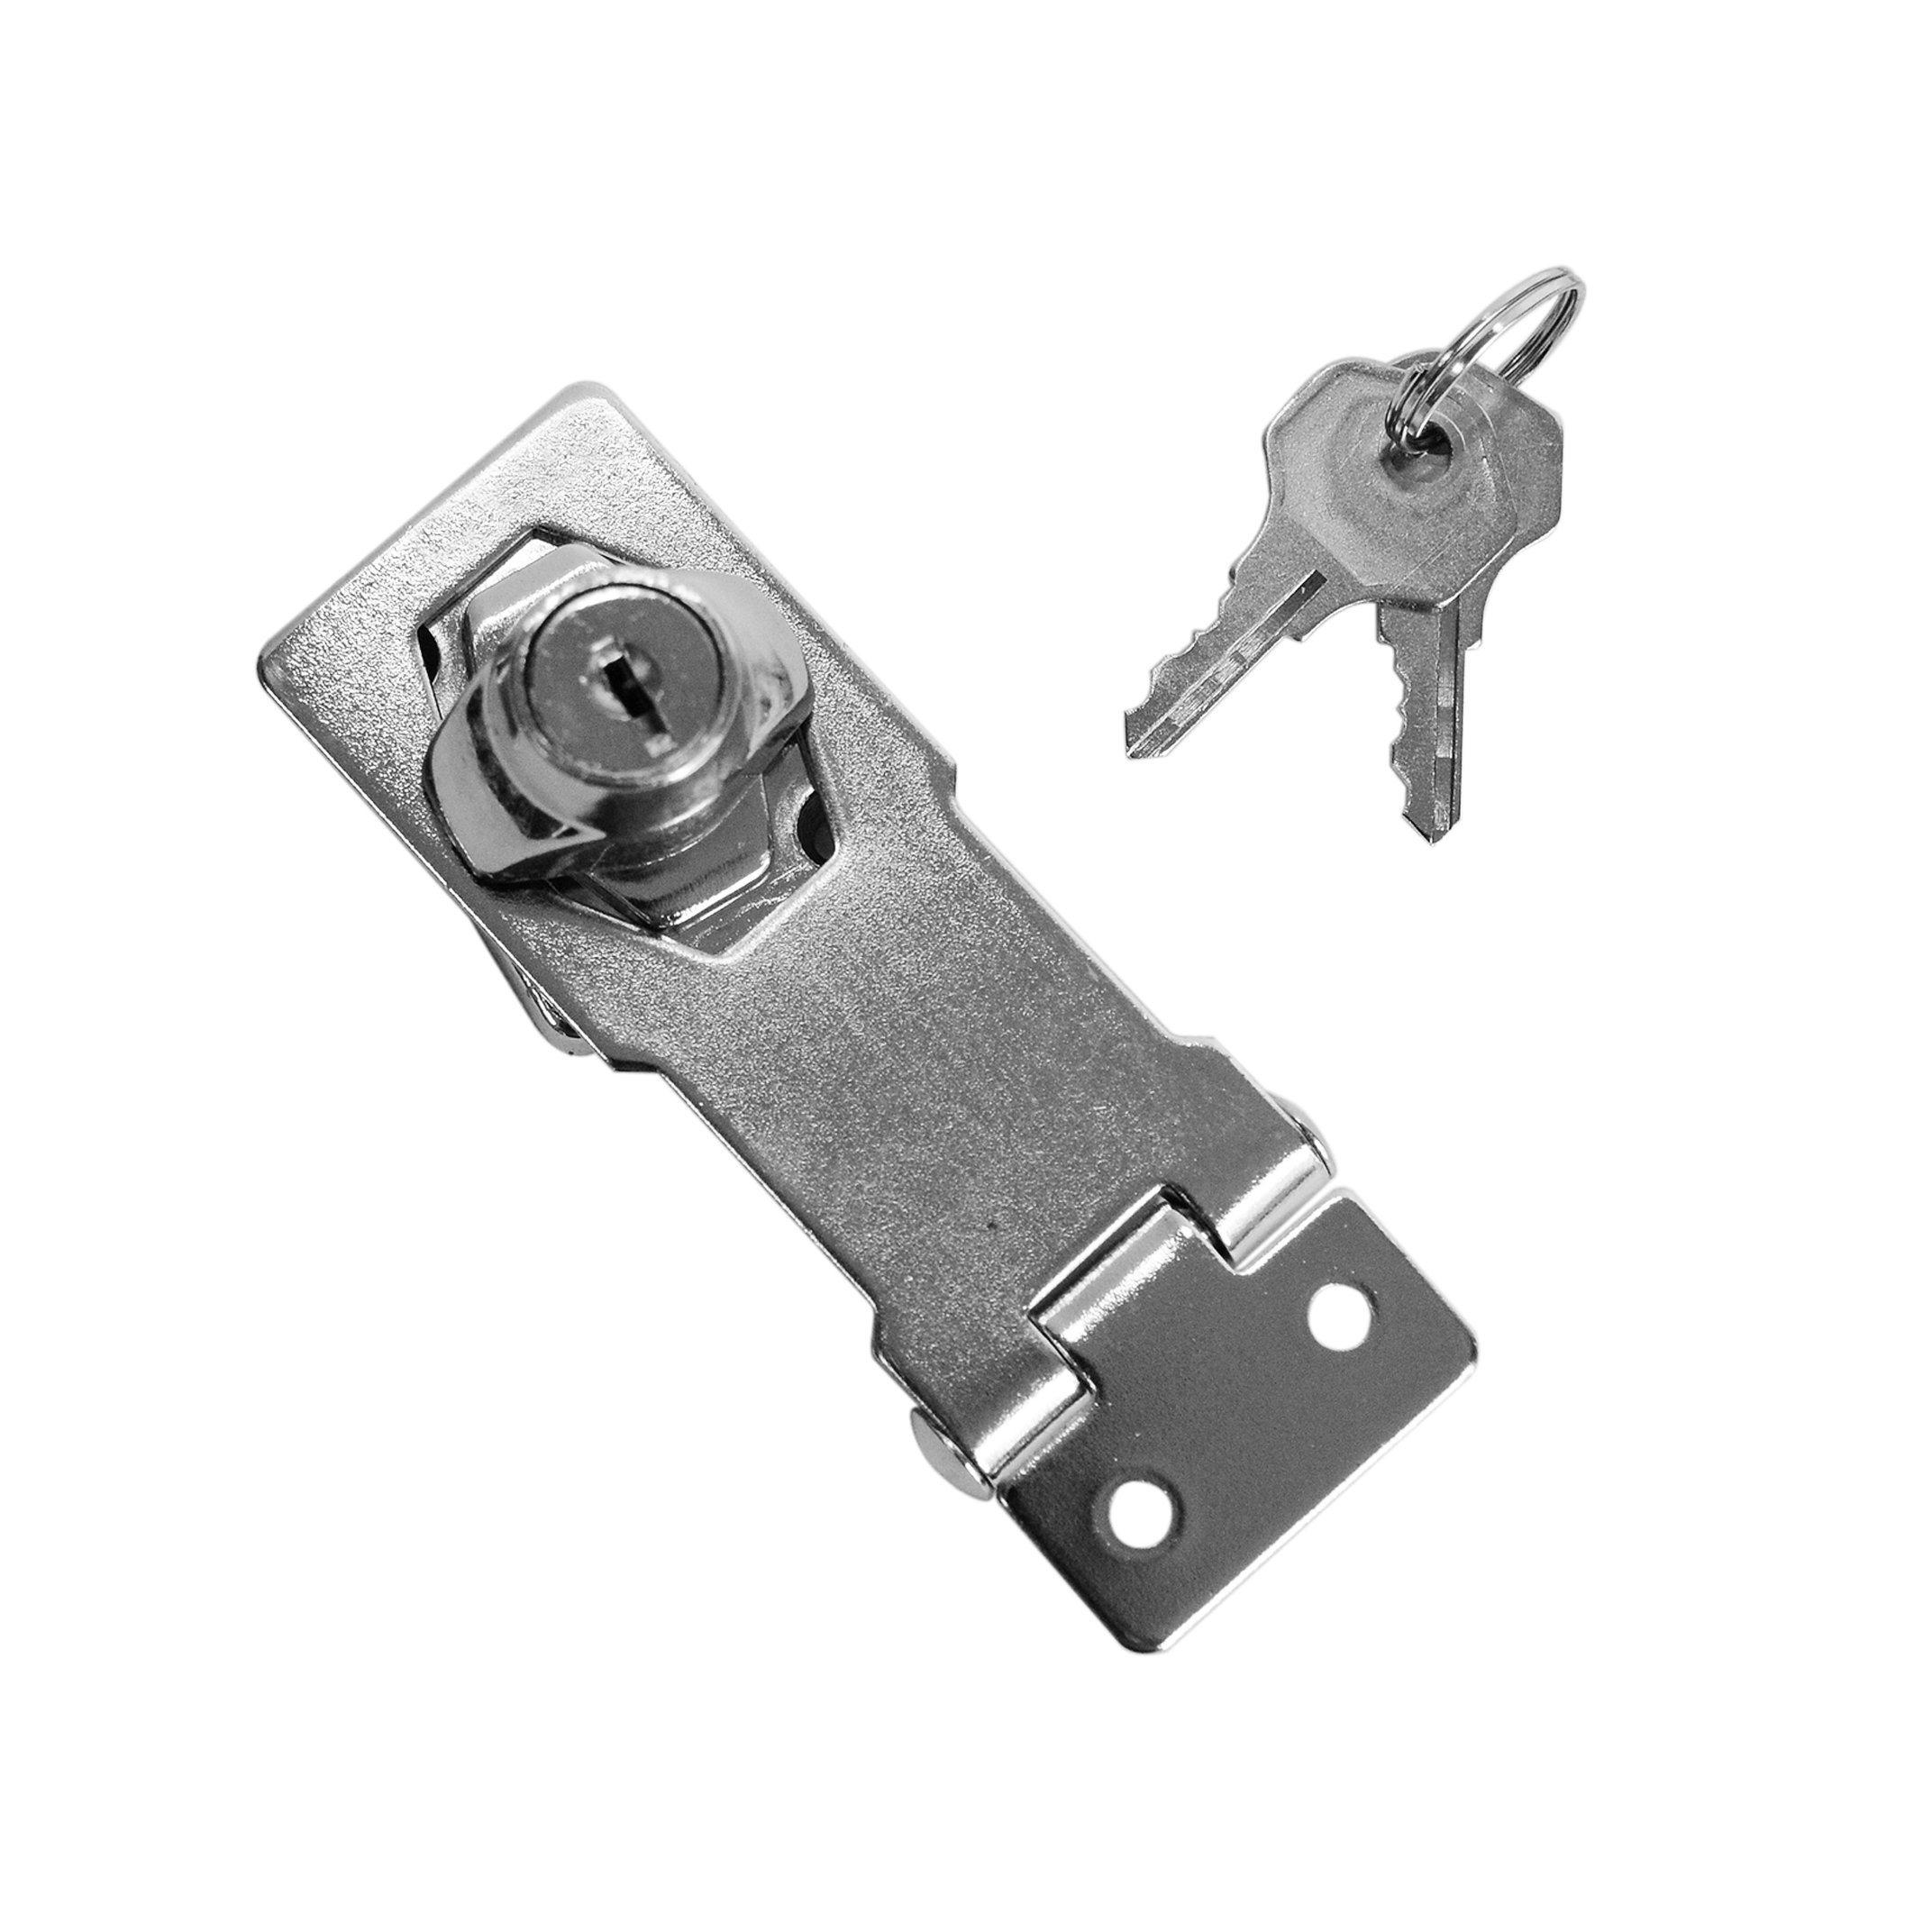 Hasp And Staple >> Hot Item Locking Hasp 4 Safety Door Zinc Keyed Hasp Staple Lock 100mm